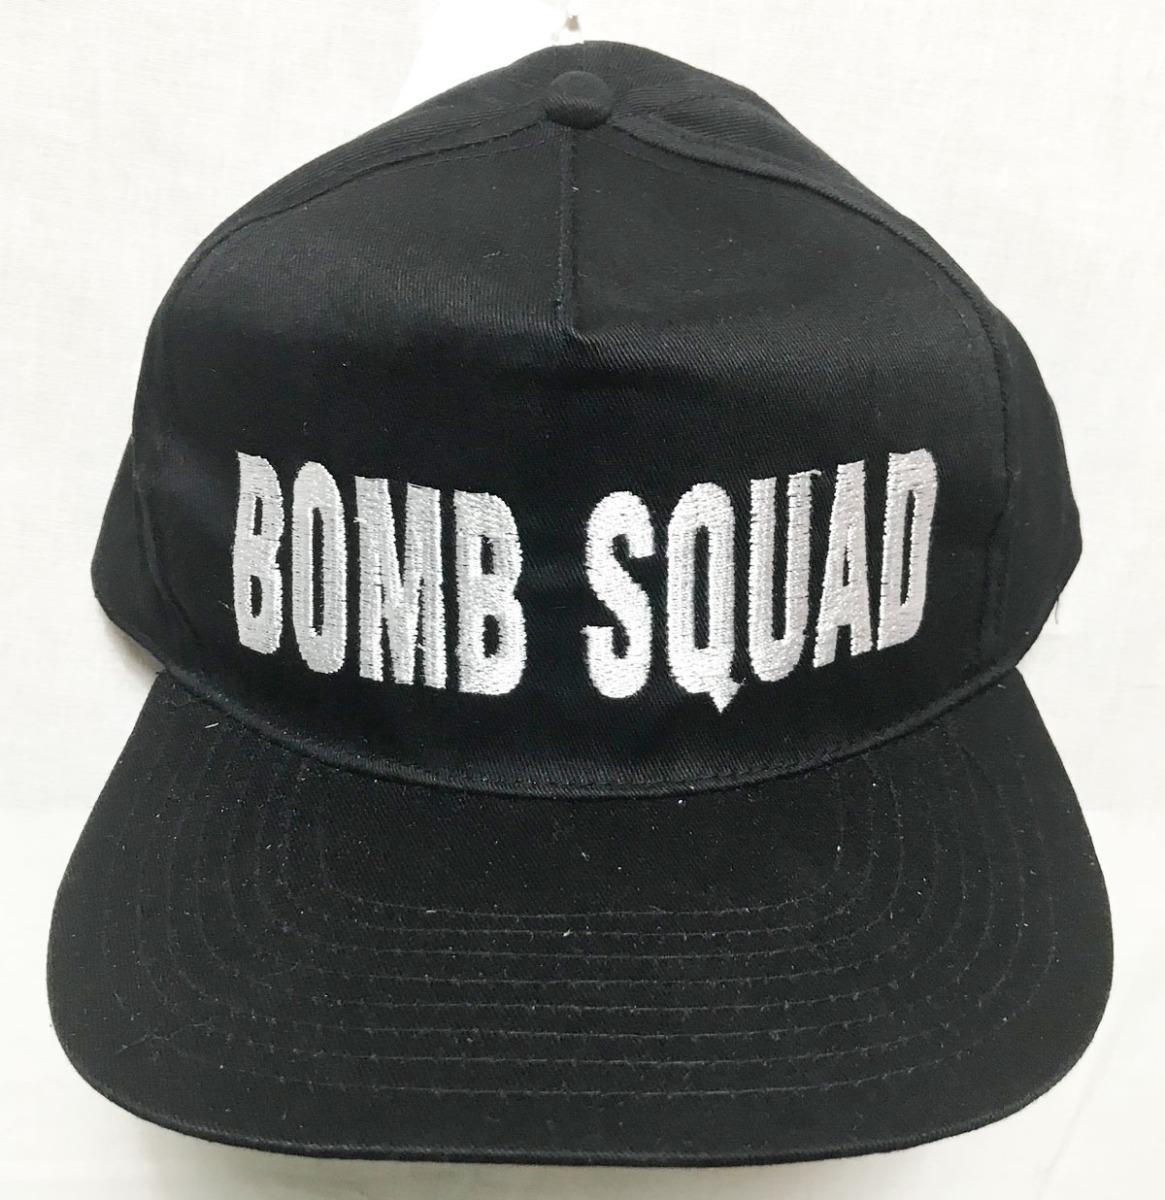 USA Bomb Squad Cap - Pet - One Size Fits All